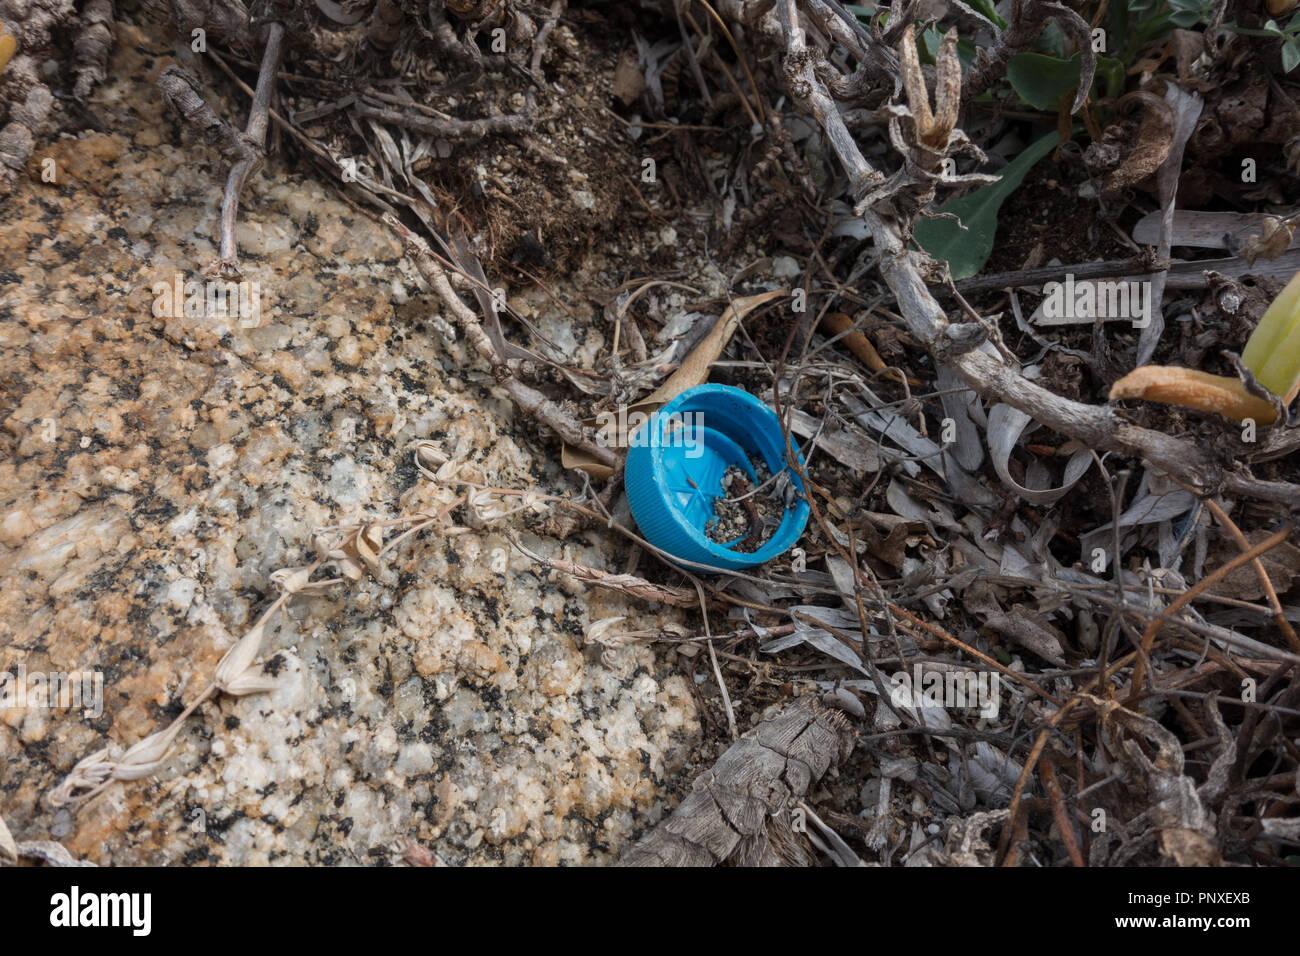 Plastic bottle top on seashore. Sardinia, Italy - Stock Image